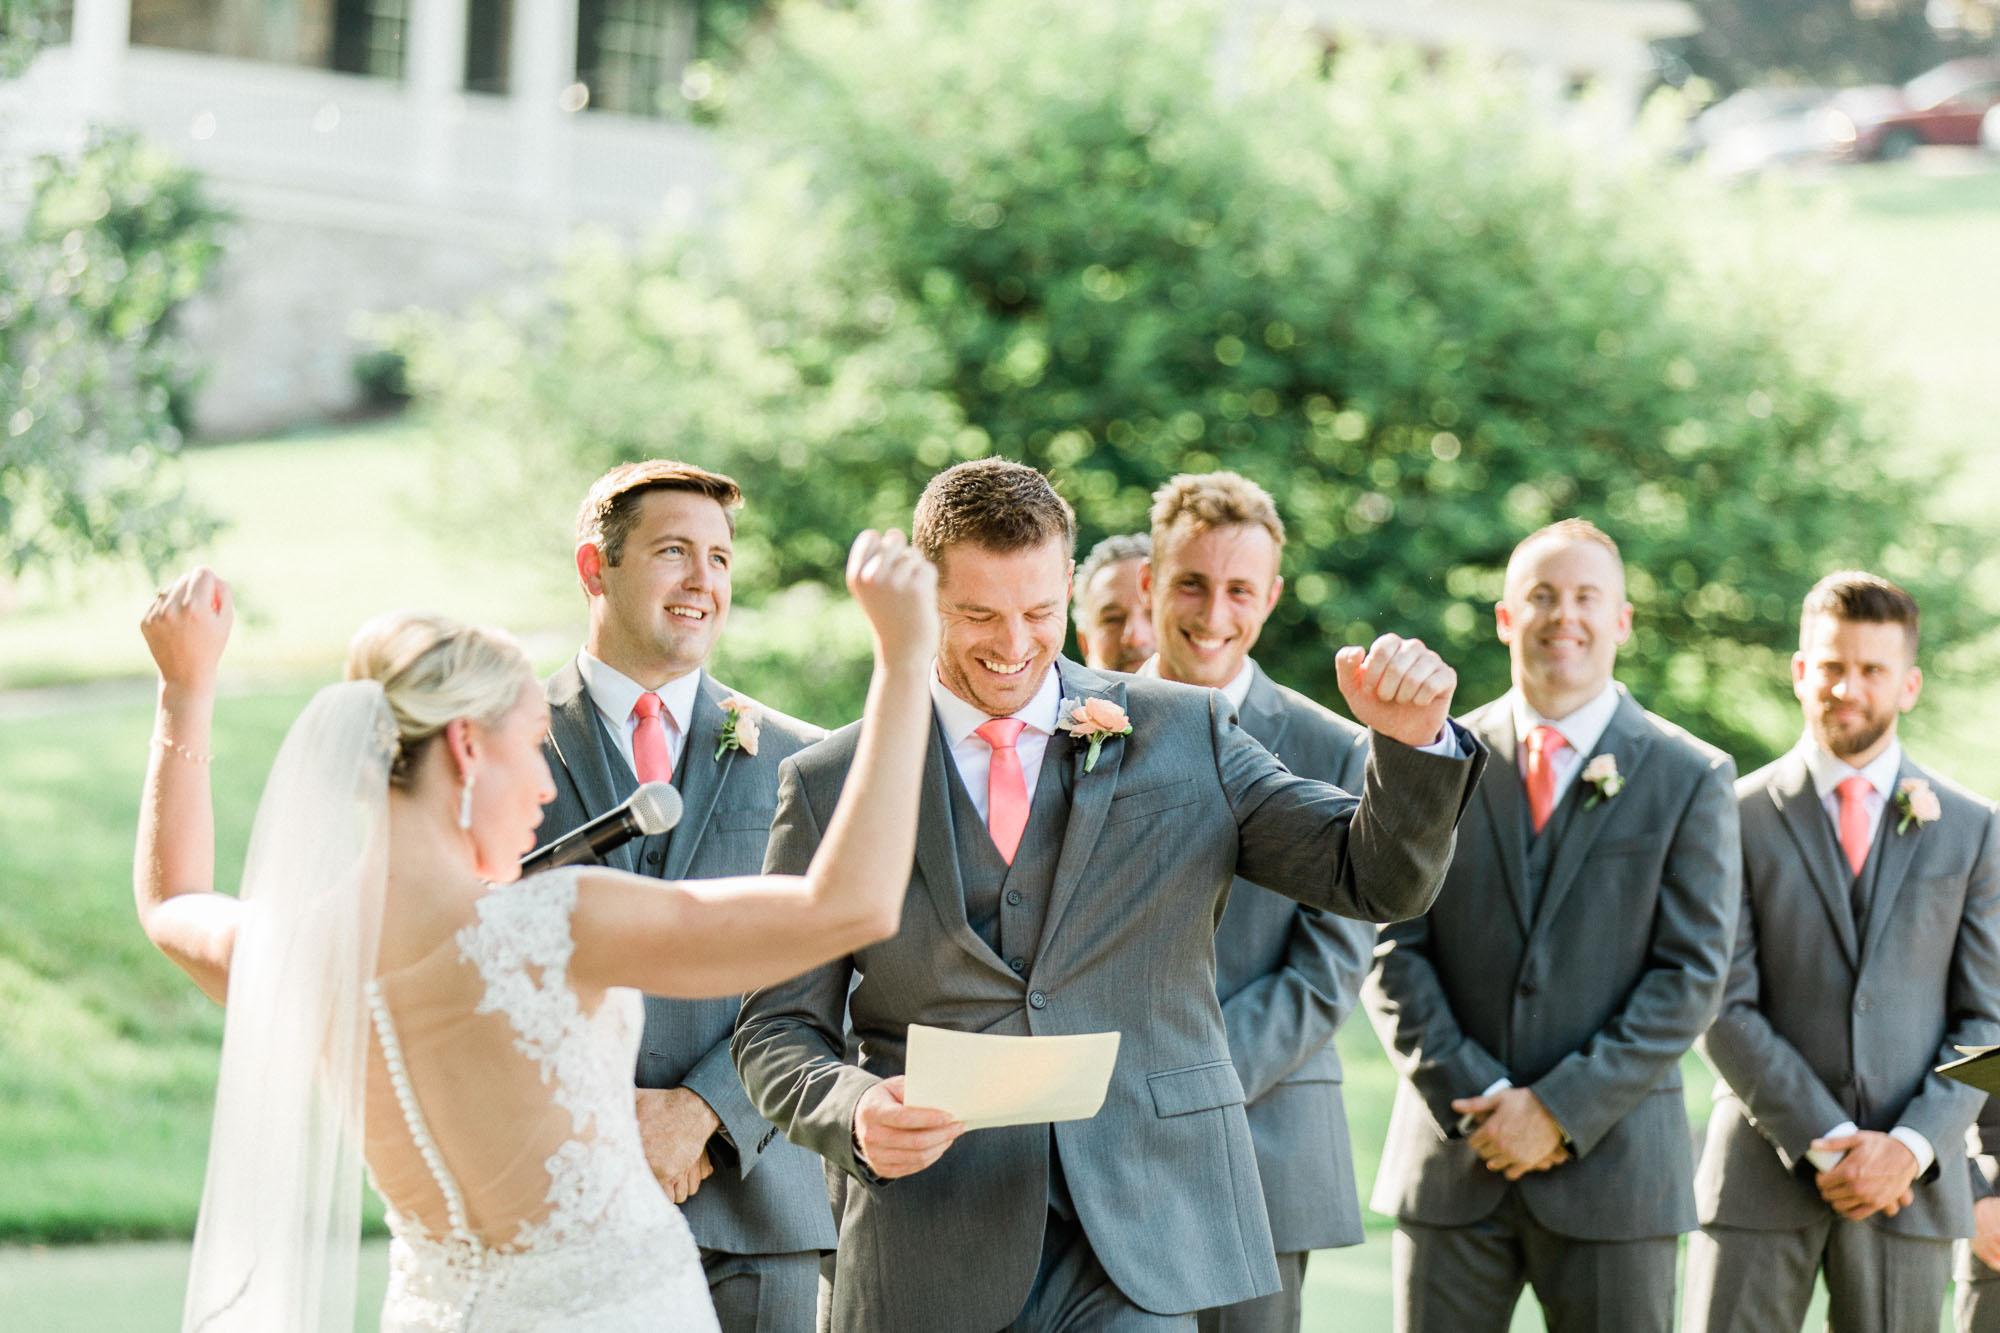 Allenberry-resort-historic-pennsylvania-wedding-21976.jpg